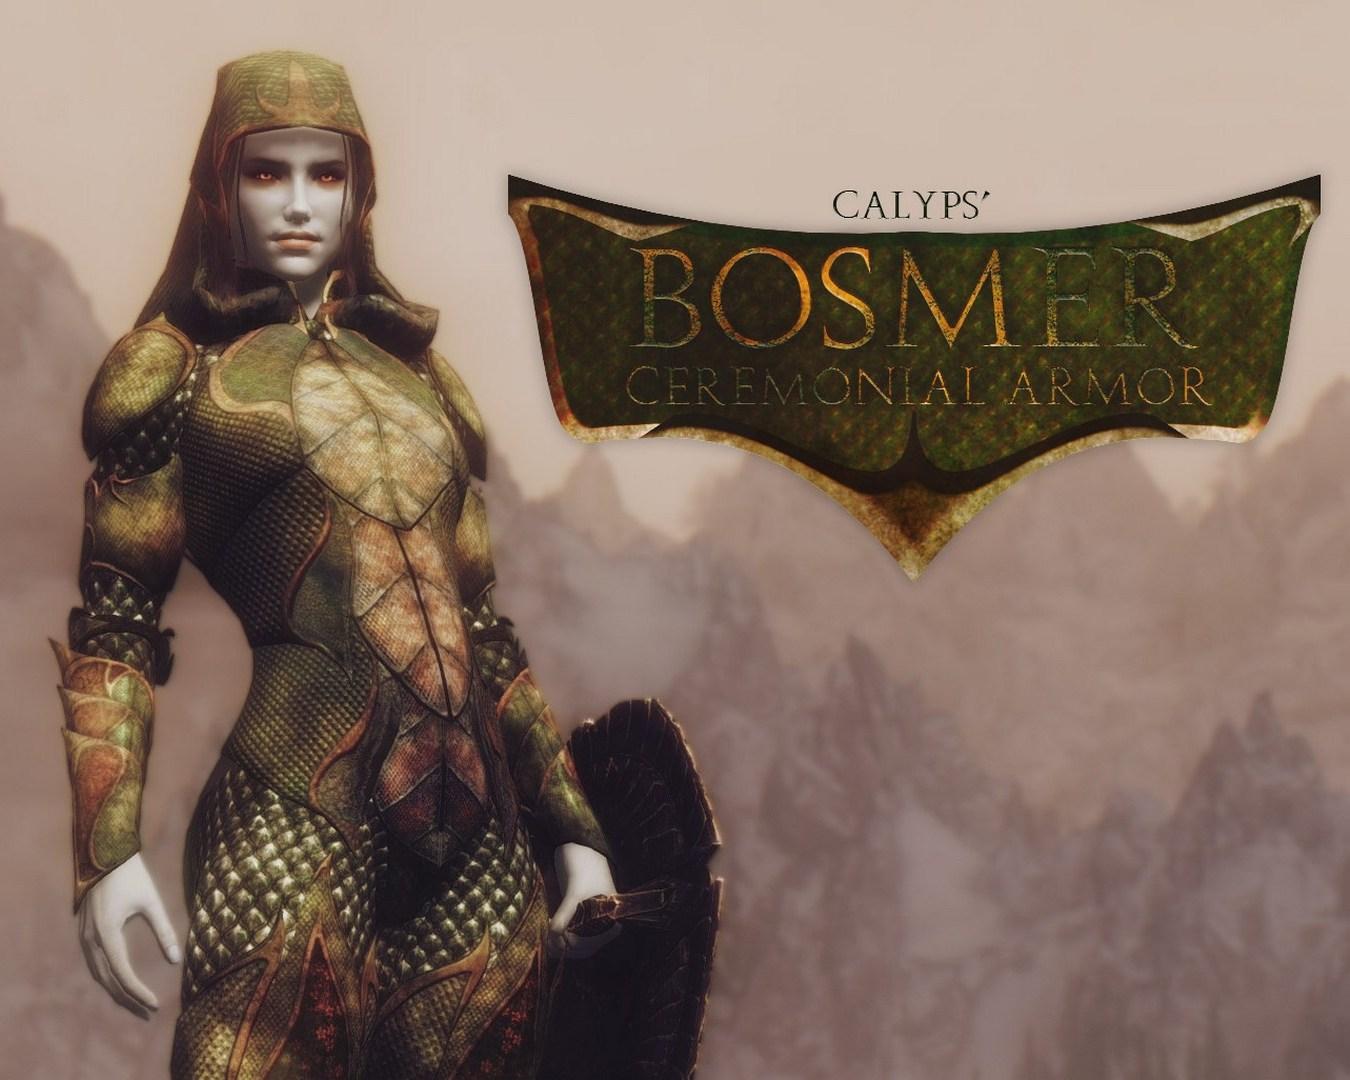 Bosmer_Ceremonial_Armor.jpg